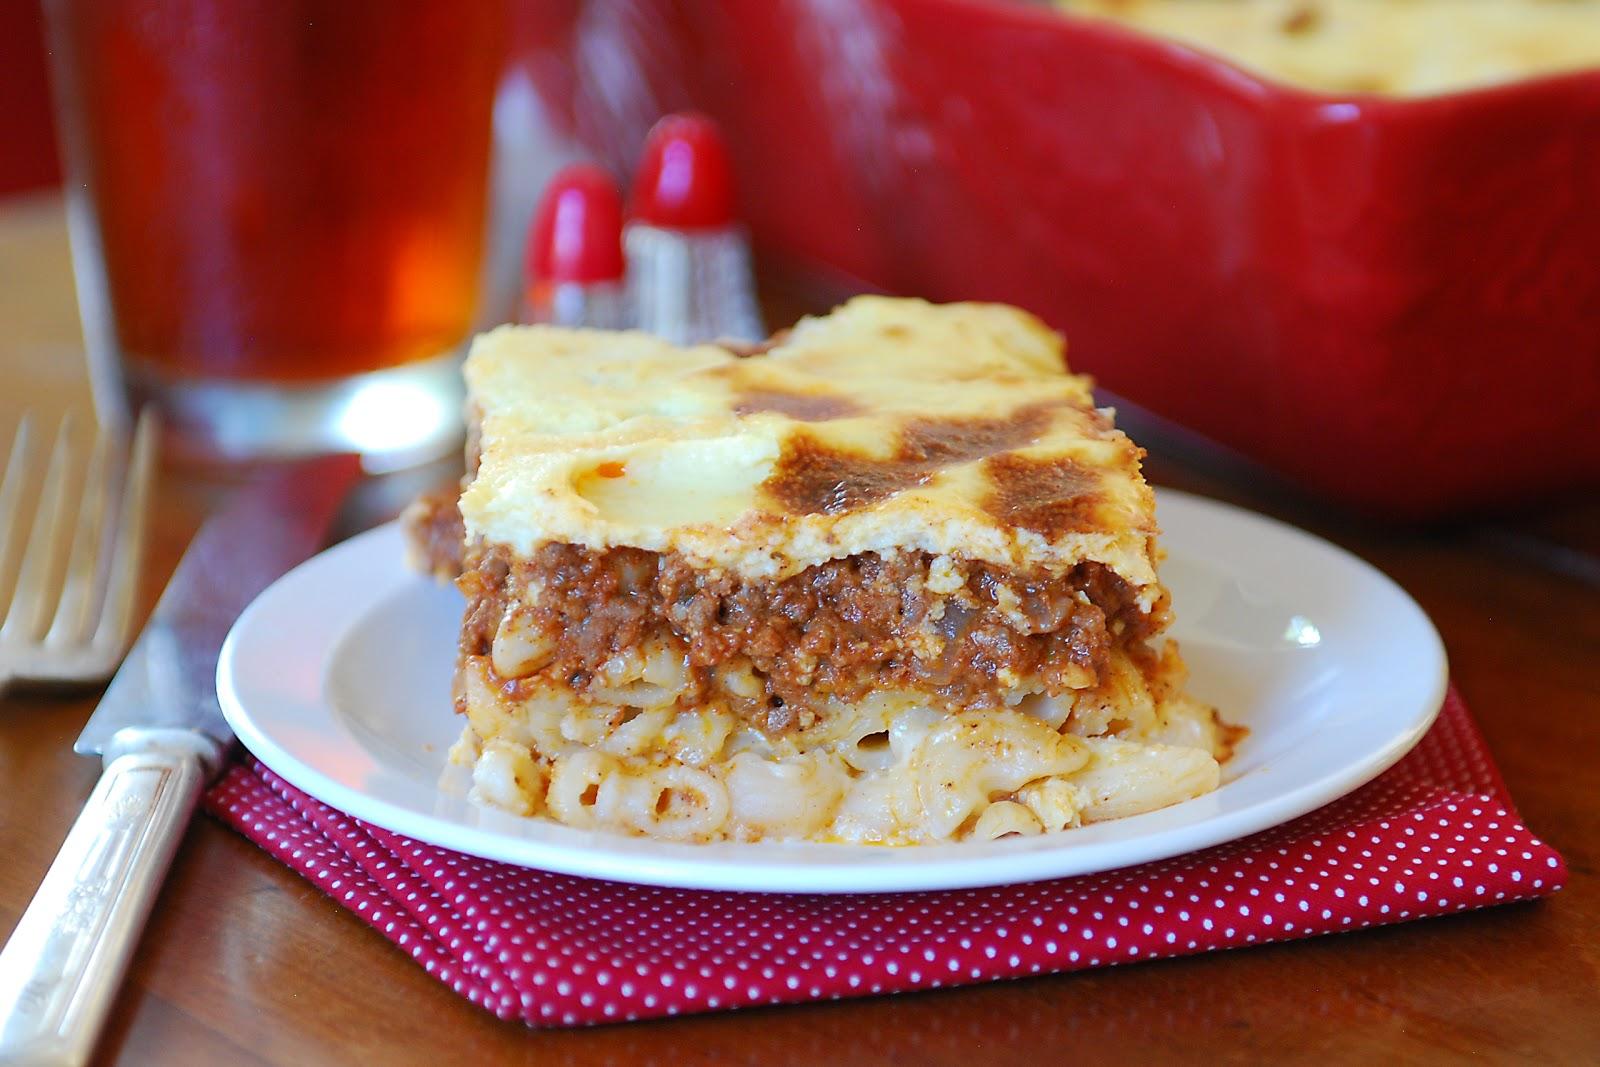 Simply Gourmet: 224. Greek Lasagna (Pastitsio)